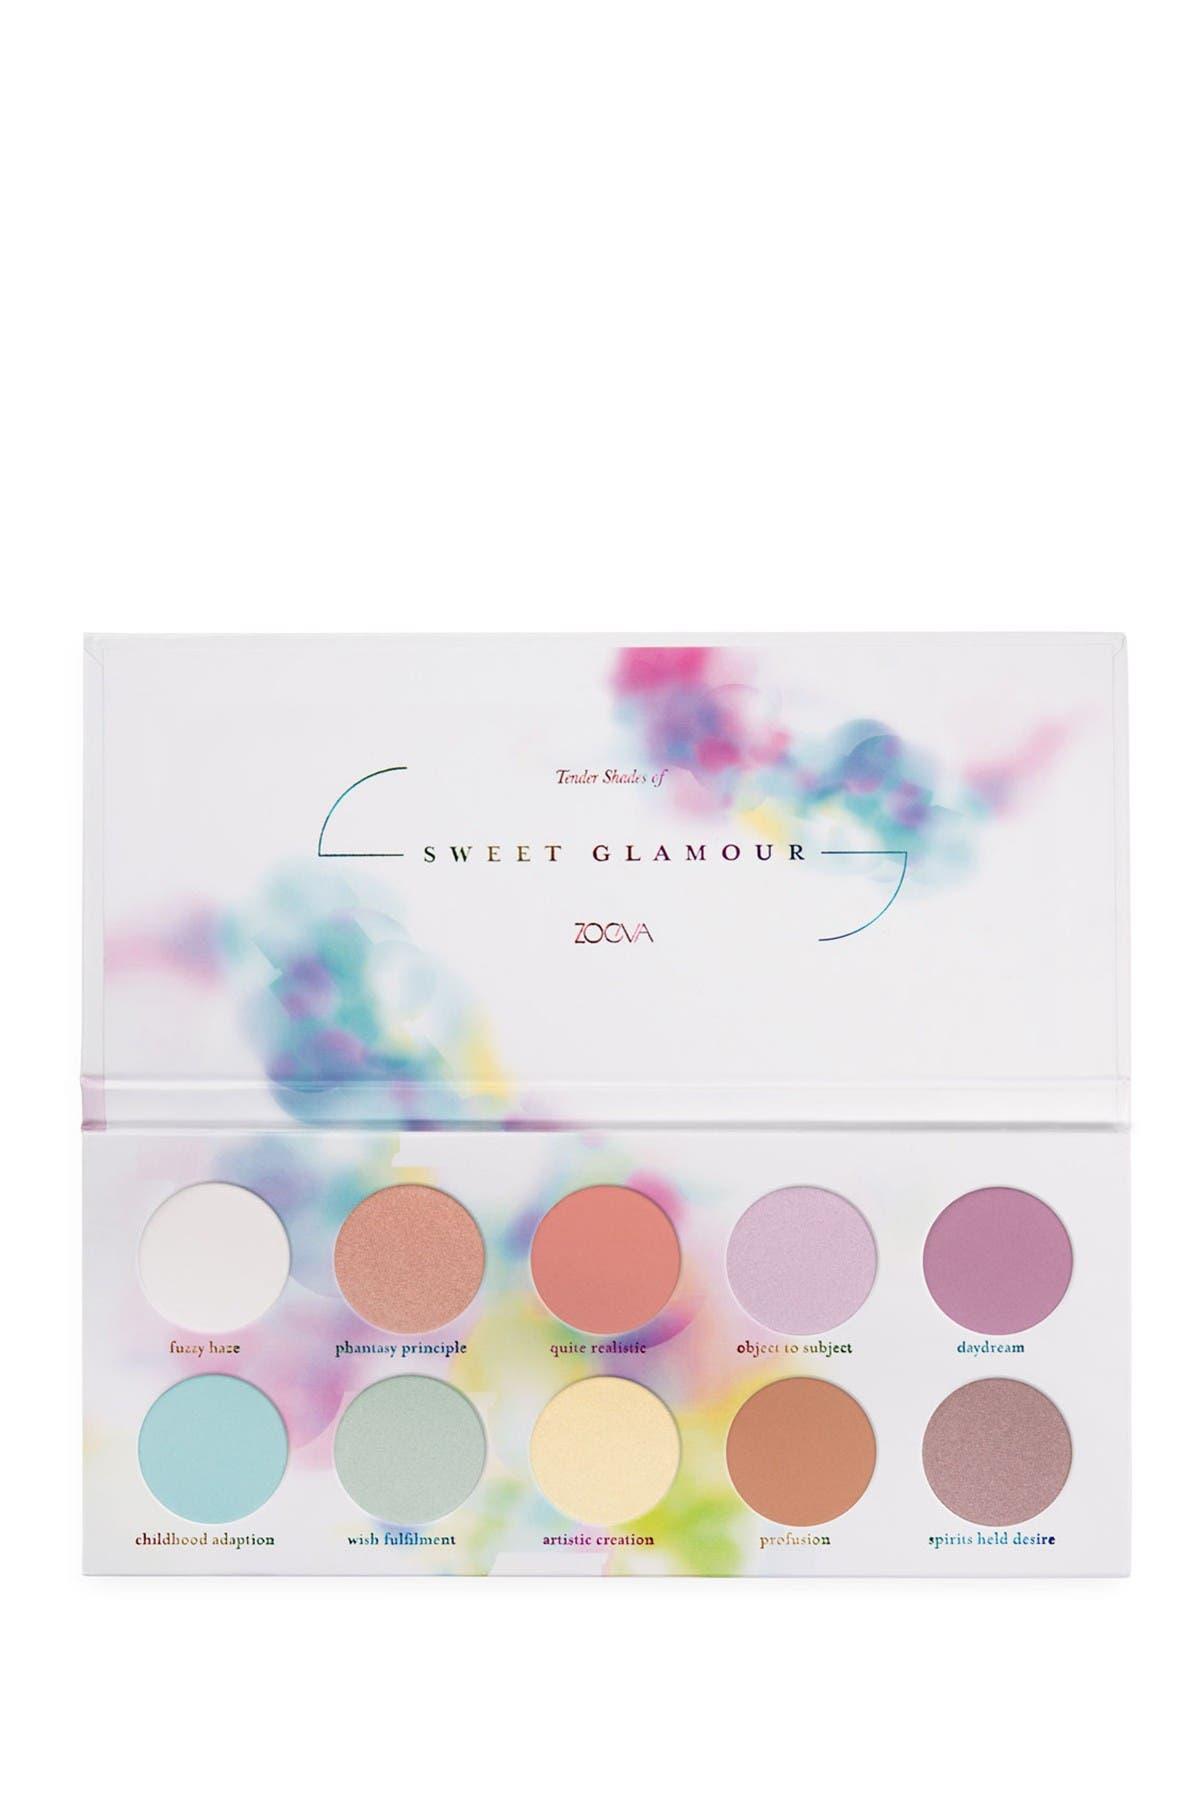 Image of Zoeva Sweet Glamour Eyeshadow Palette